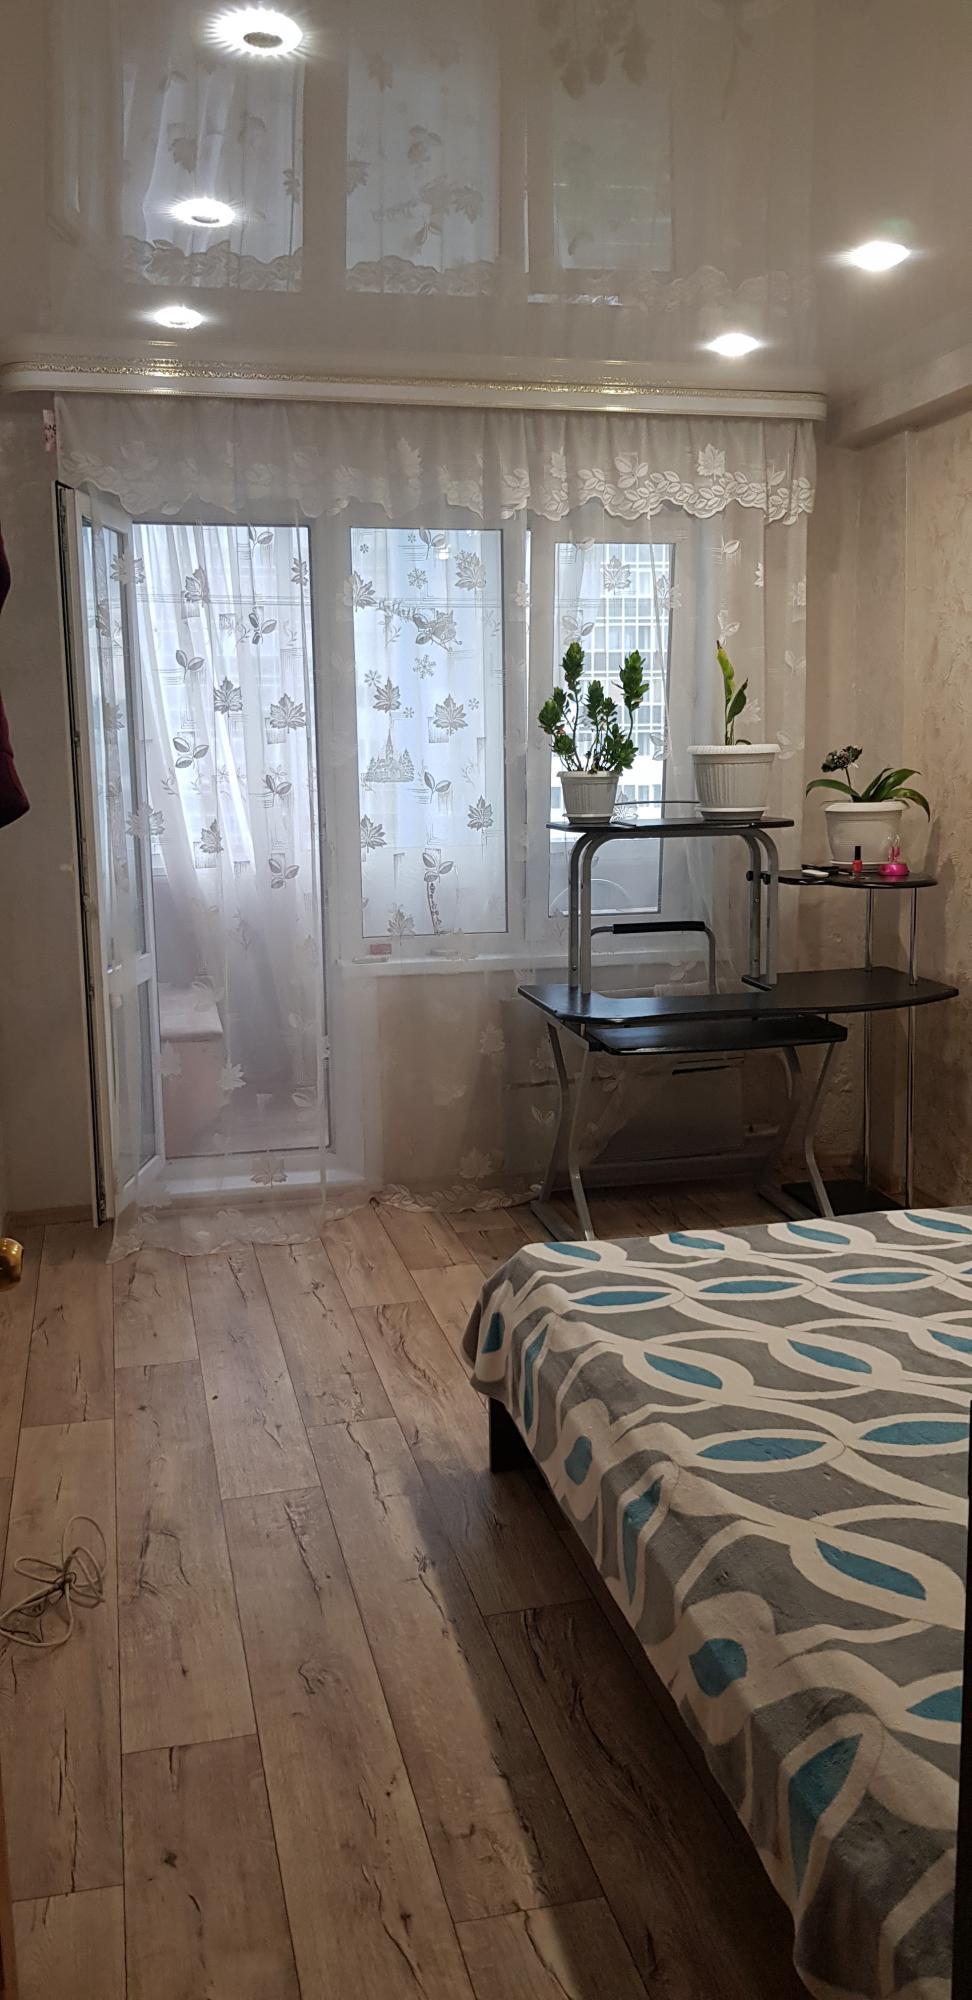 2к квартира улица Краснодарская, 3 | 18000 | аренда в Красноярске фото 0